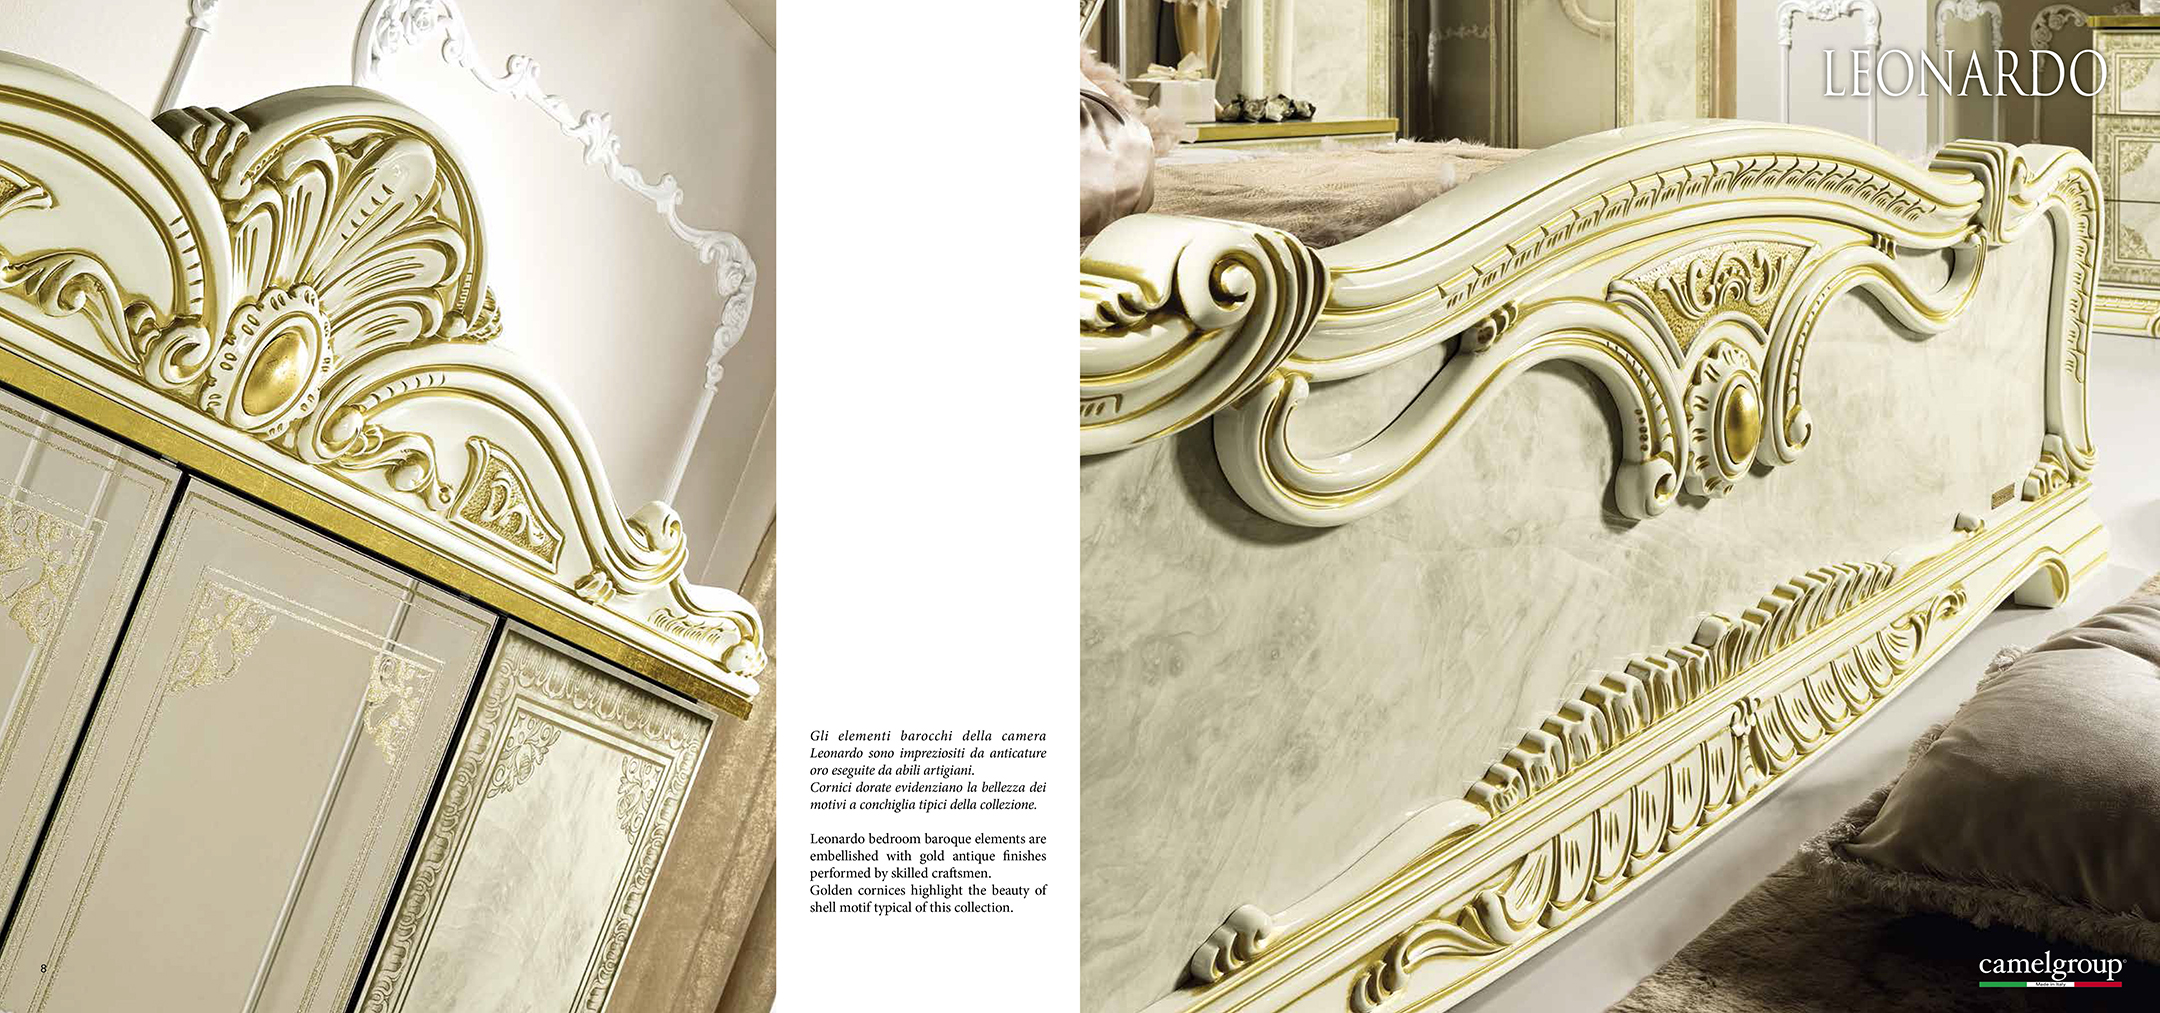 Leonardo Bedroom Camelgroup Italy Classic Bedrooms